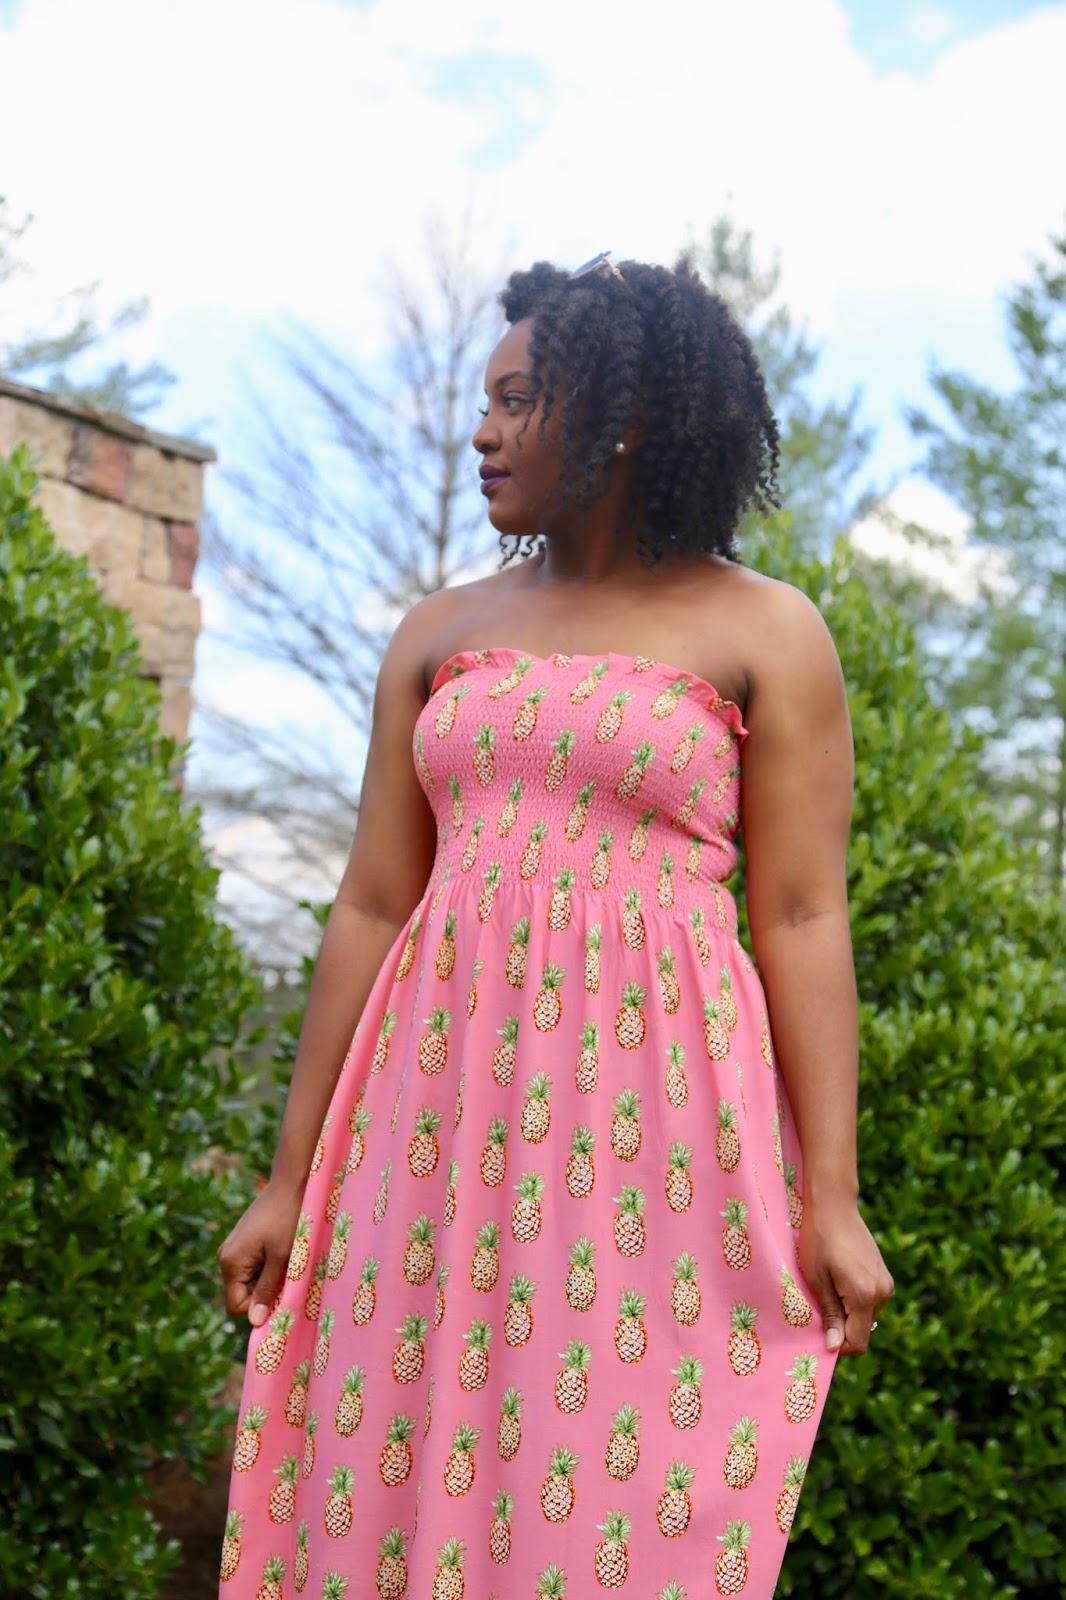 DIY Smocked Maxi Dress Tutorial - I've Moved!!!